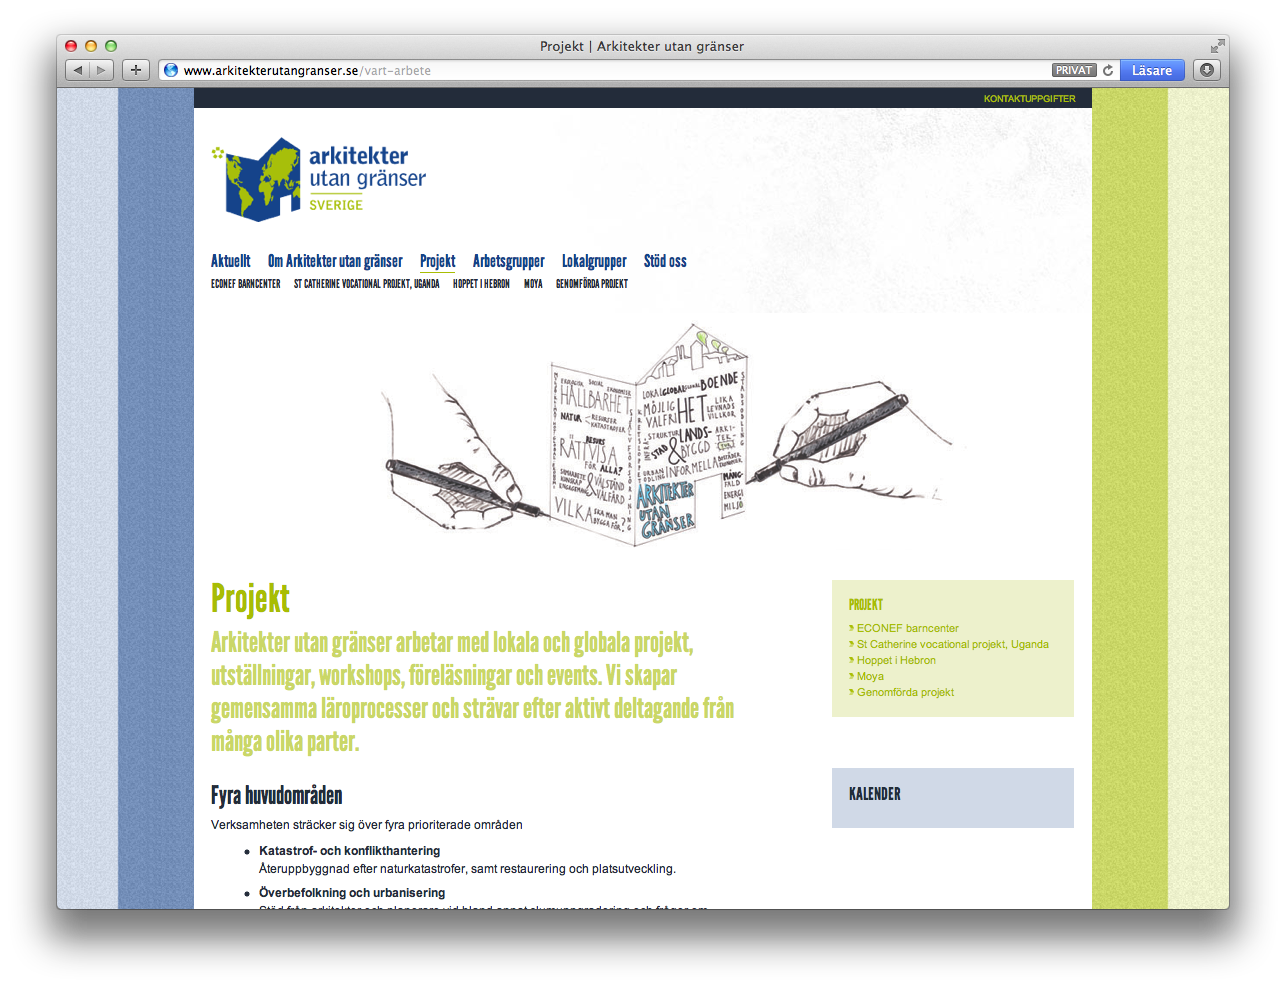 Arkitekter utan granser - projekt